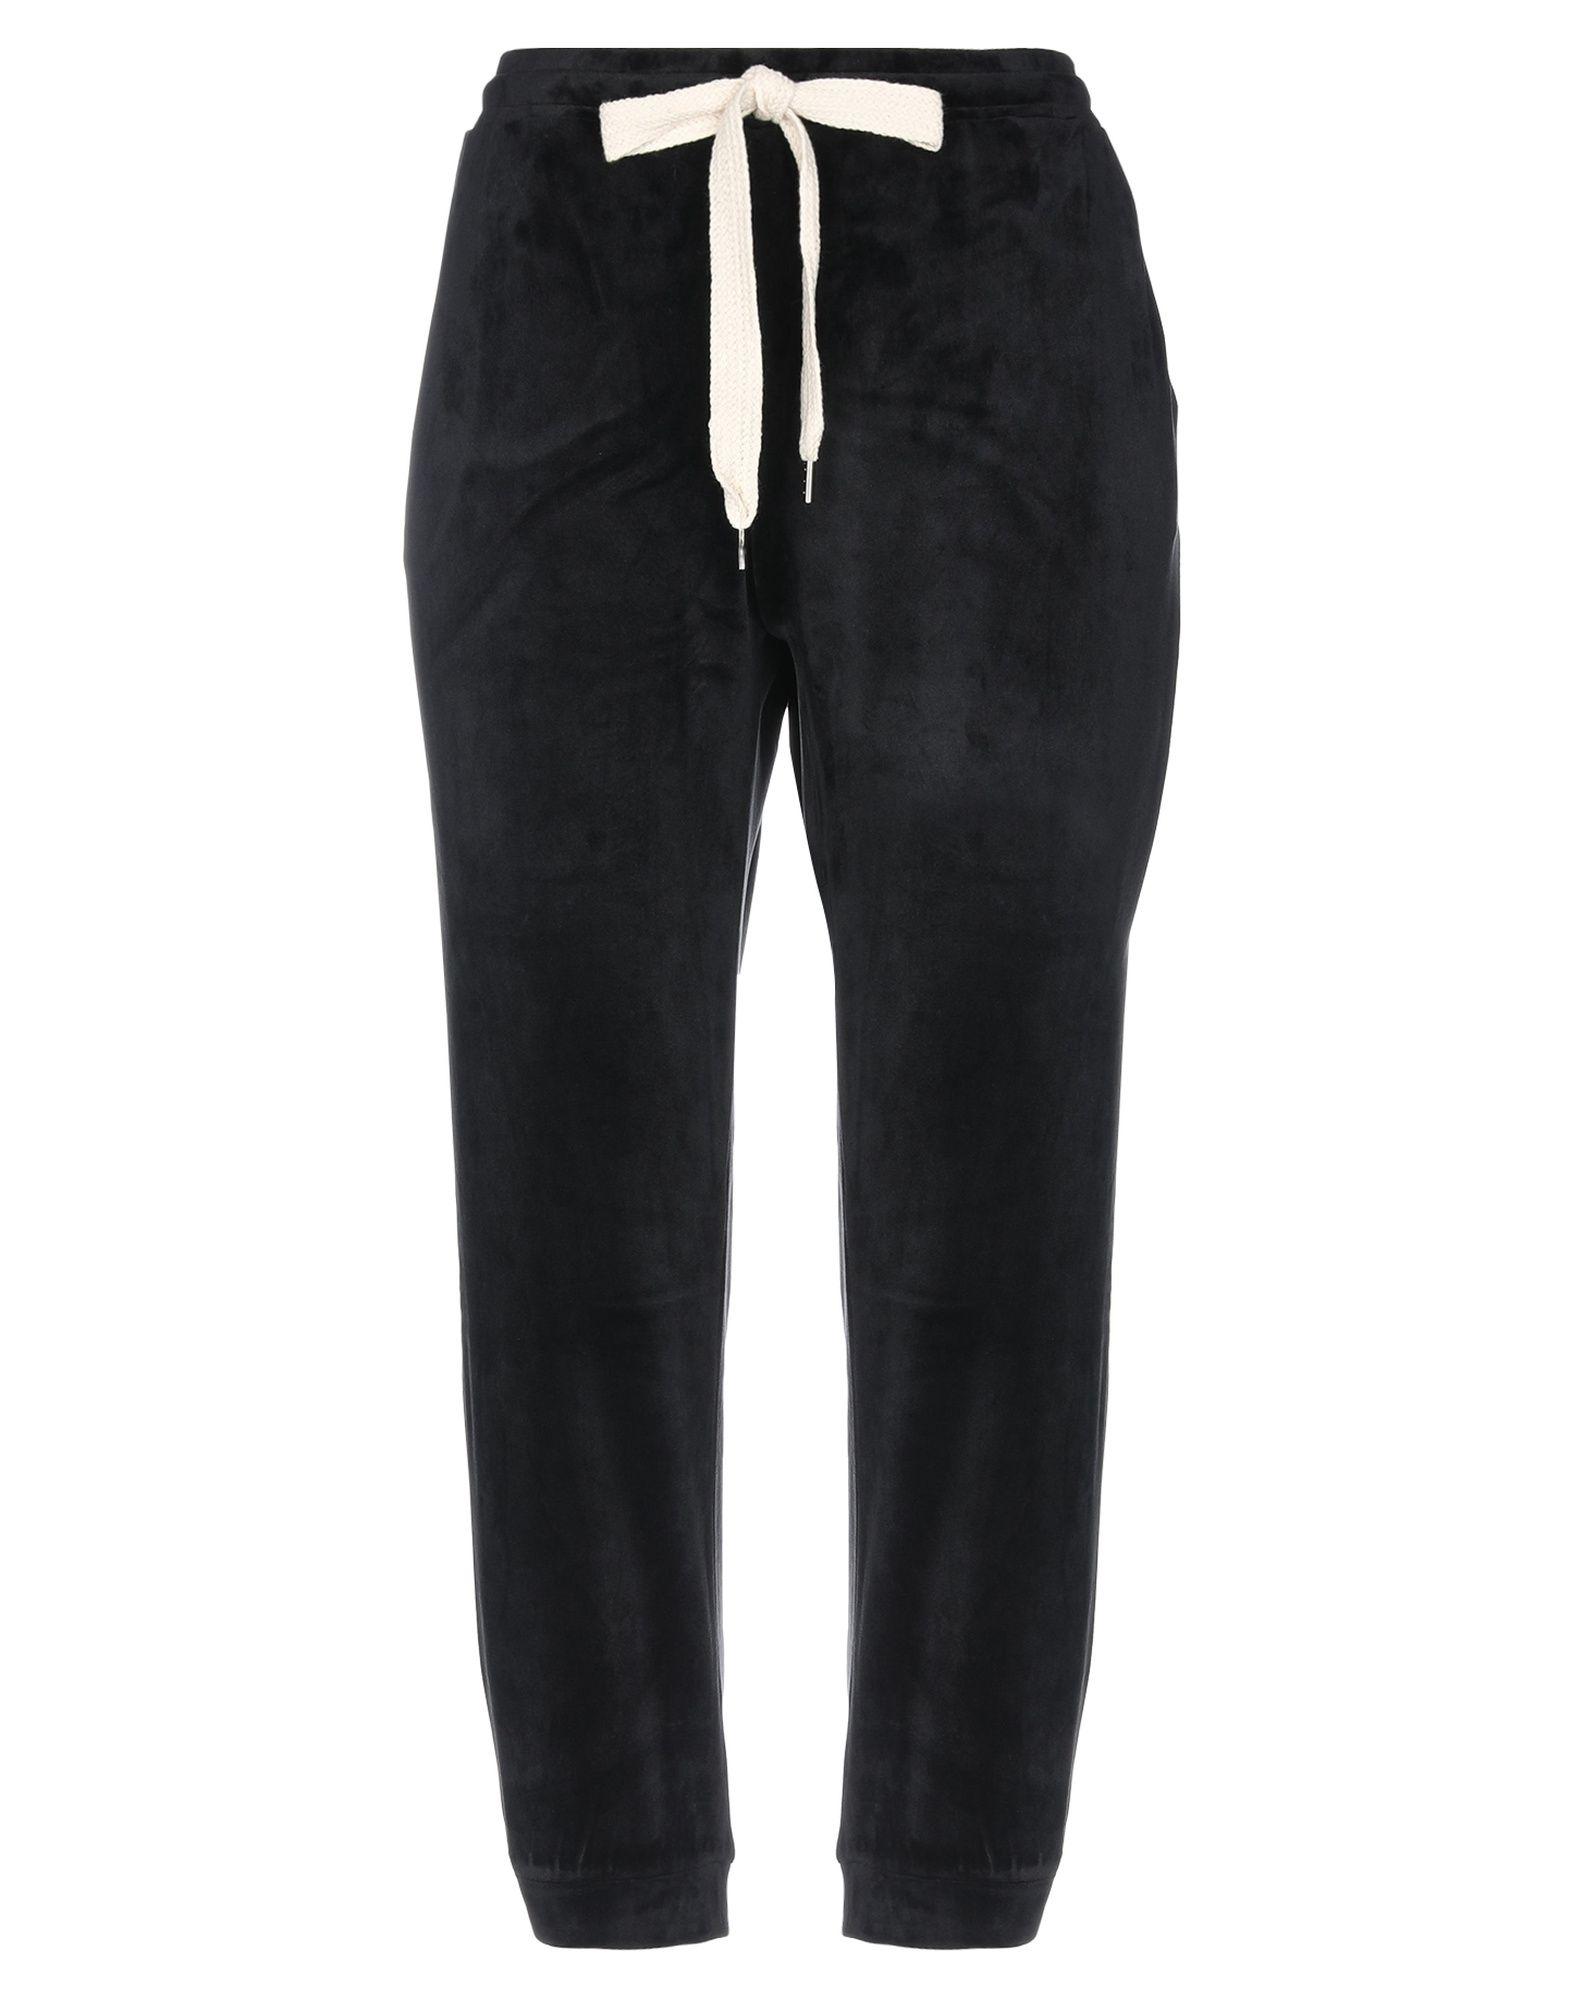 Lab Anna Rachele Casual Pants In Black